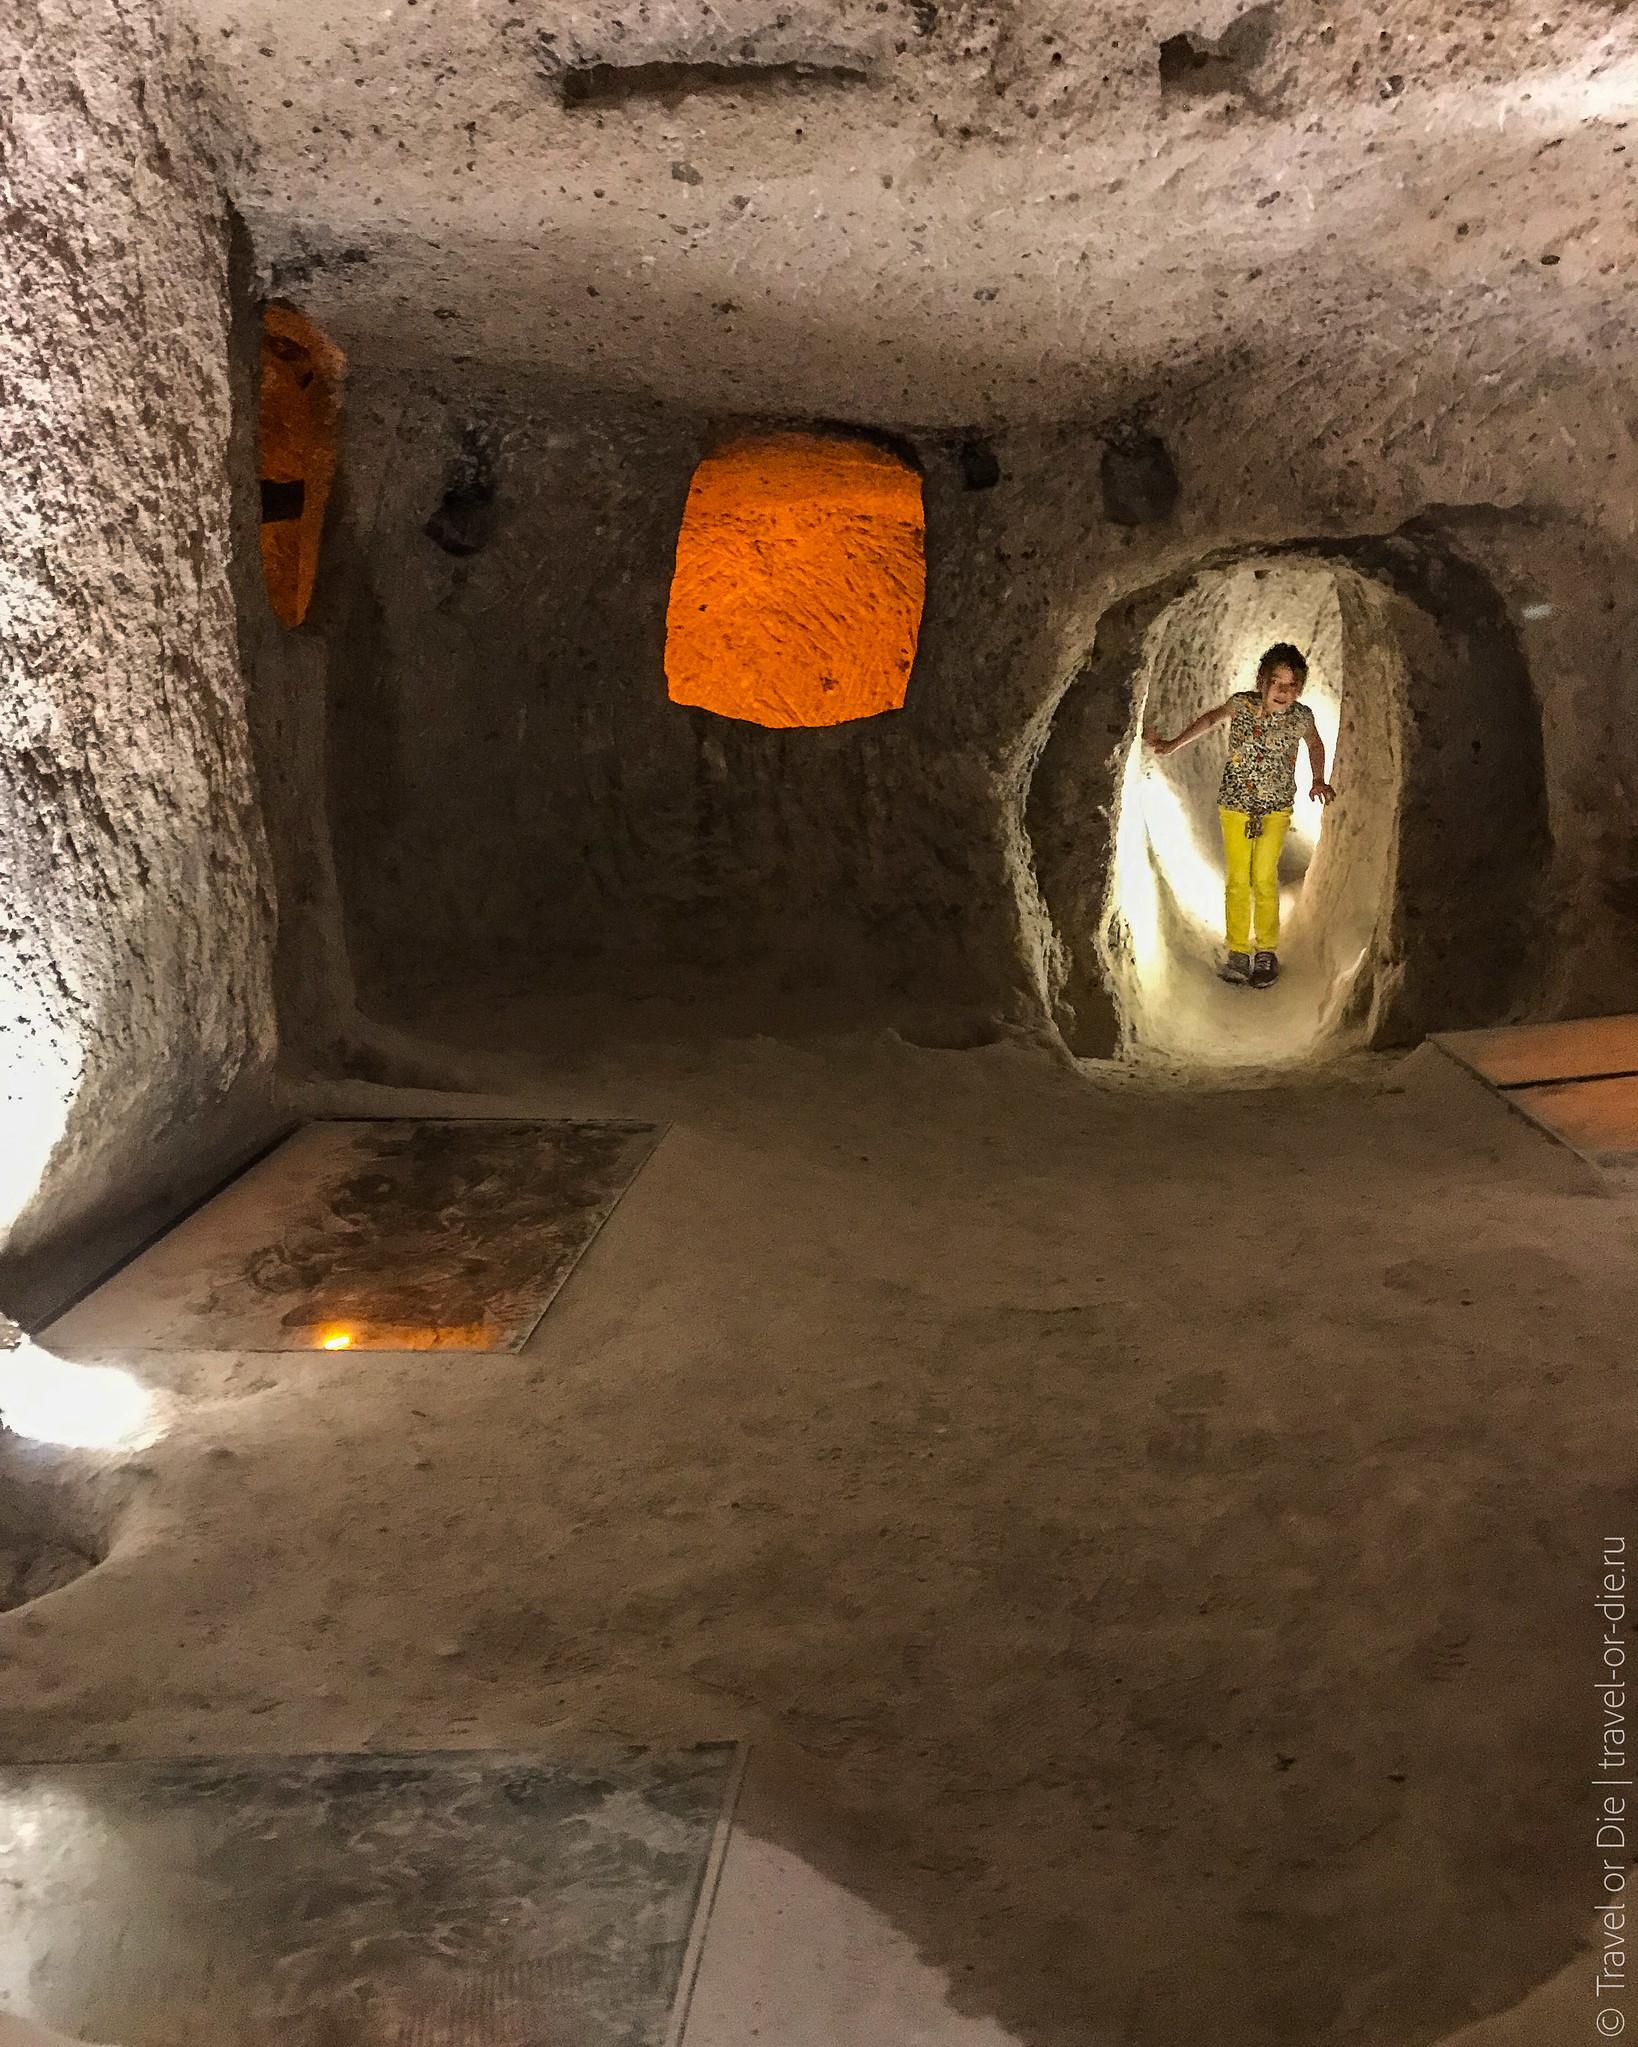 Kaymakli-Underground-City-Cappadocia-8257